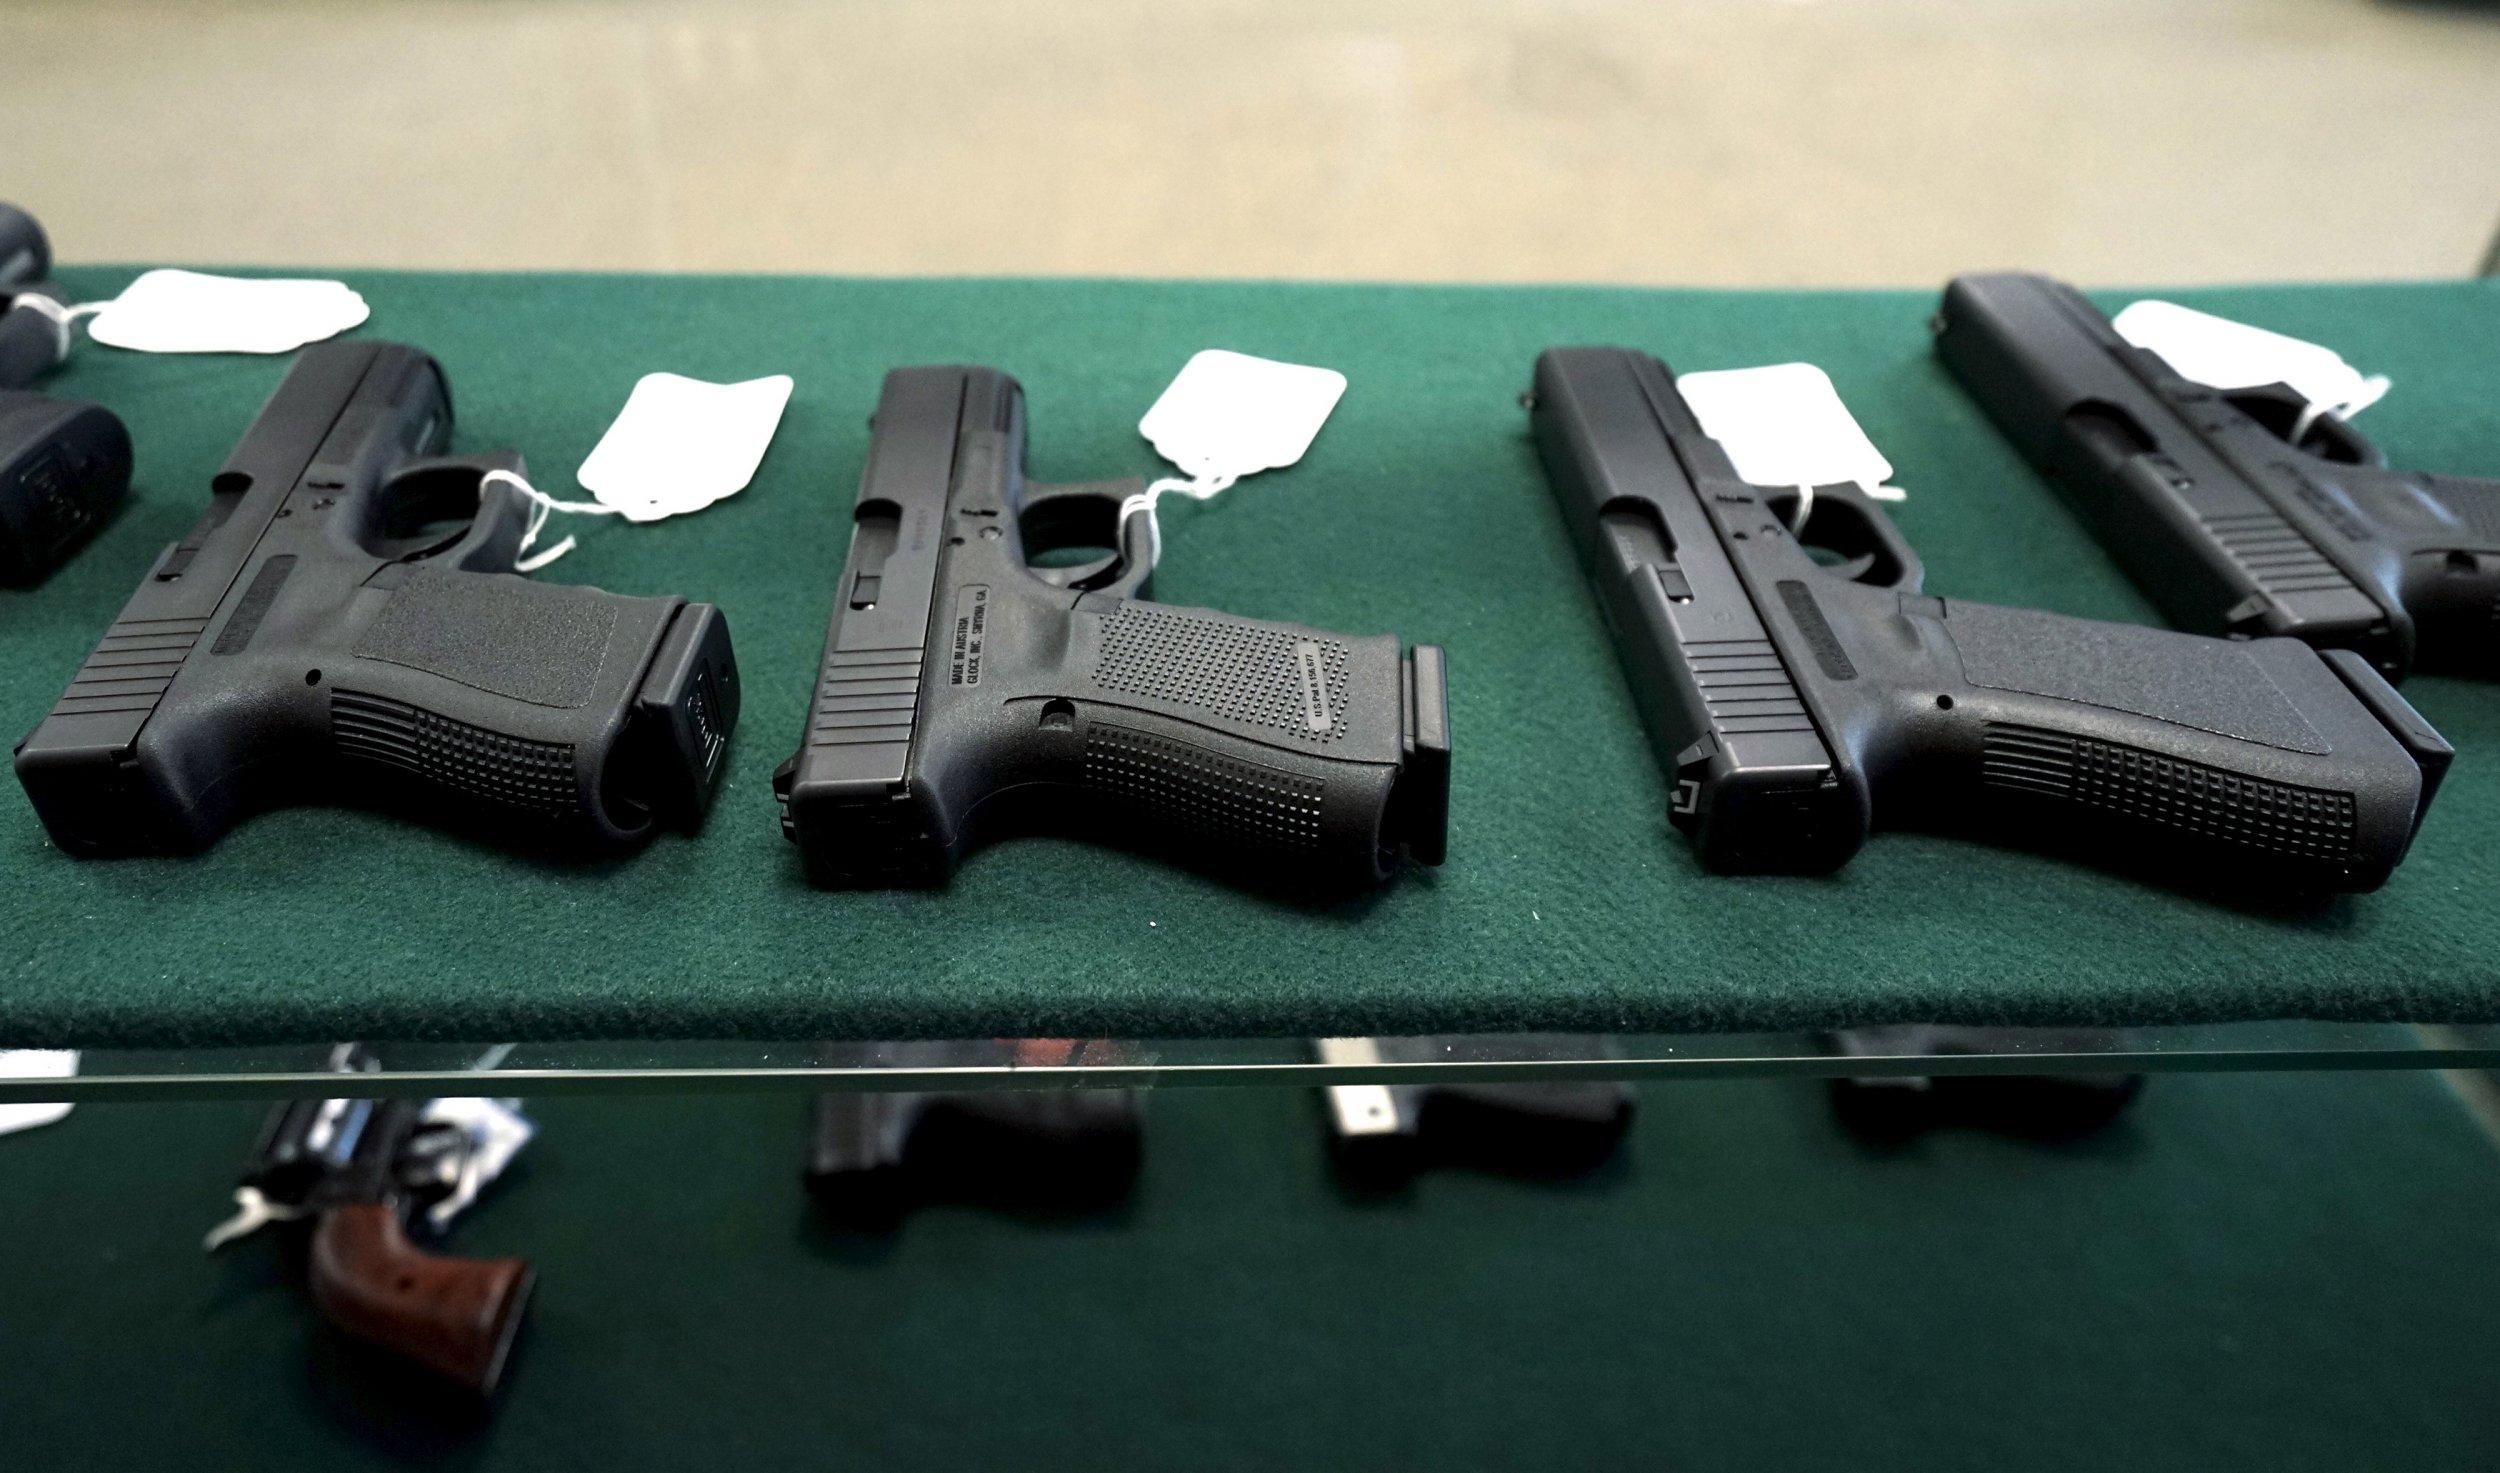 0721_guns_female_homicides_CDC_01